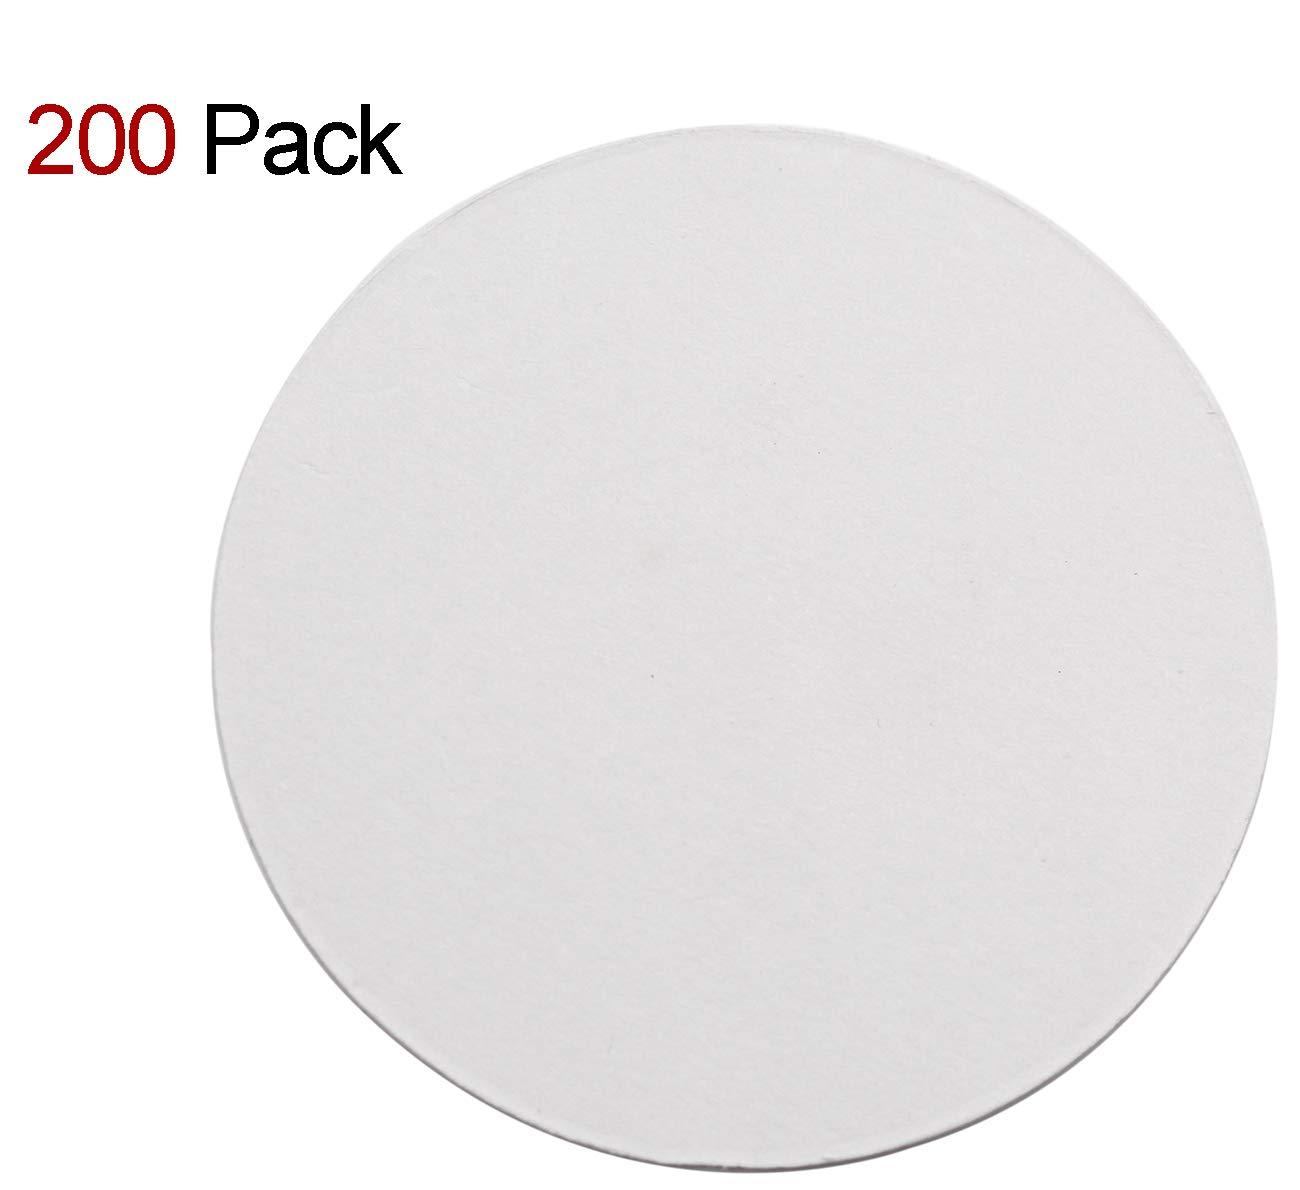 TravelWell Round 3.54 Inch Diameter Thicker (0.8 MM) Non Slip Drink White Paper Coaster Set – Set of 200